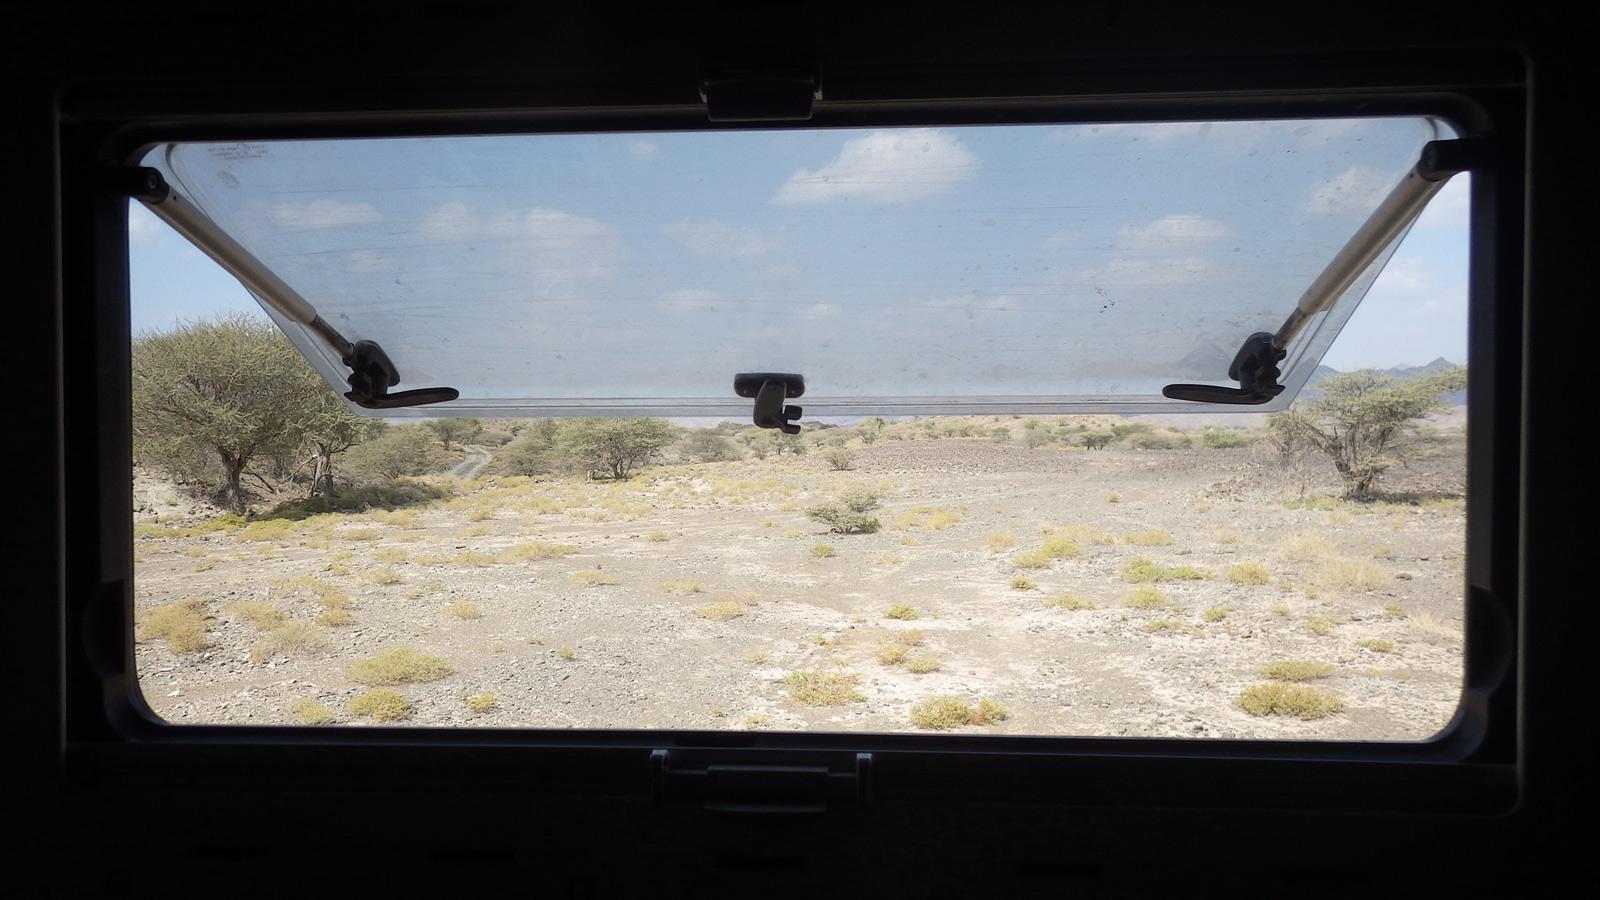 IMGP2878_2016_01_11-Oued-vers-wadi-Khafifah-(Oman)